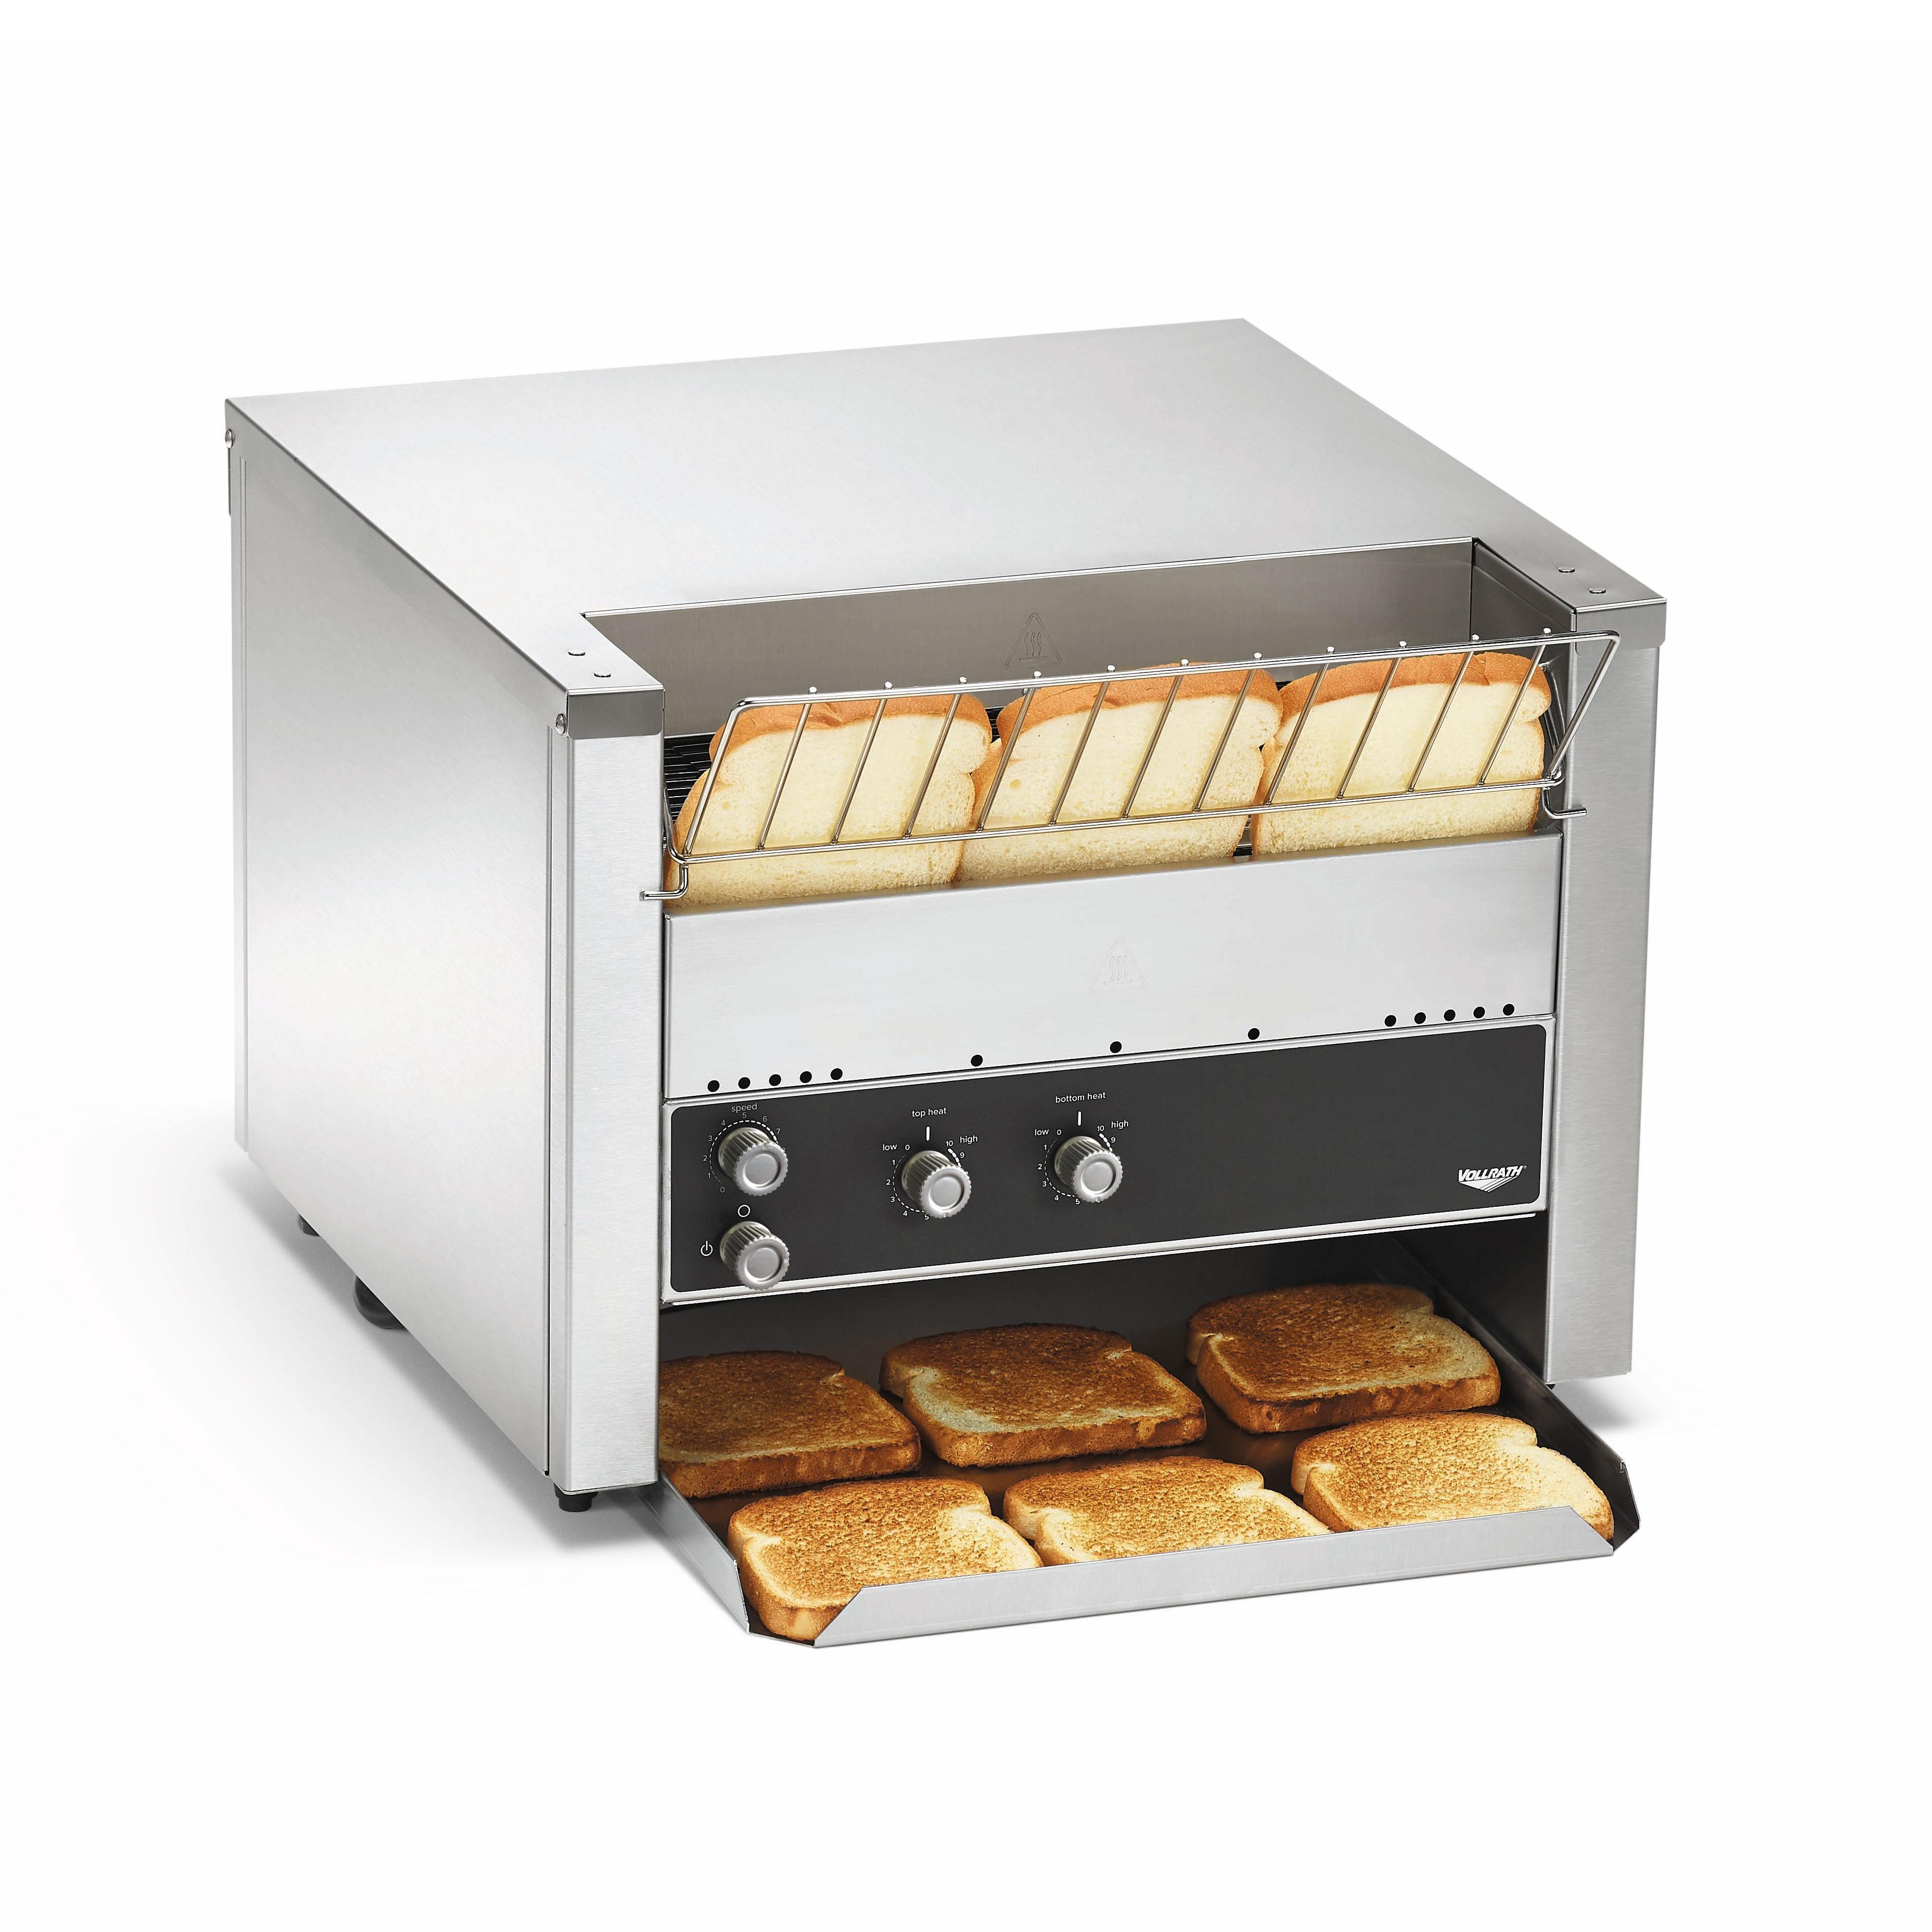 Vollrath CT4-2081000 toaster, conveyor type